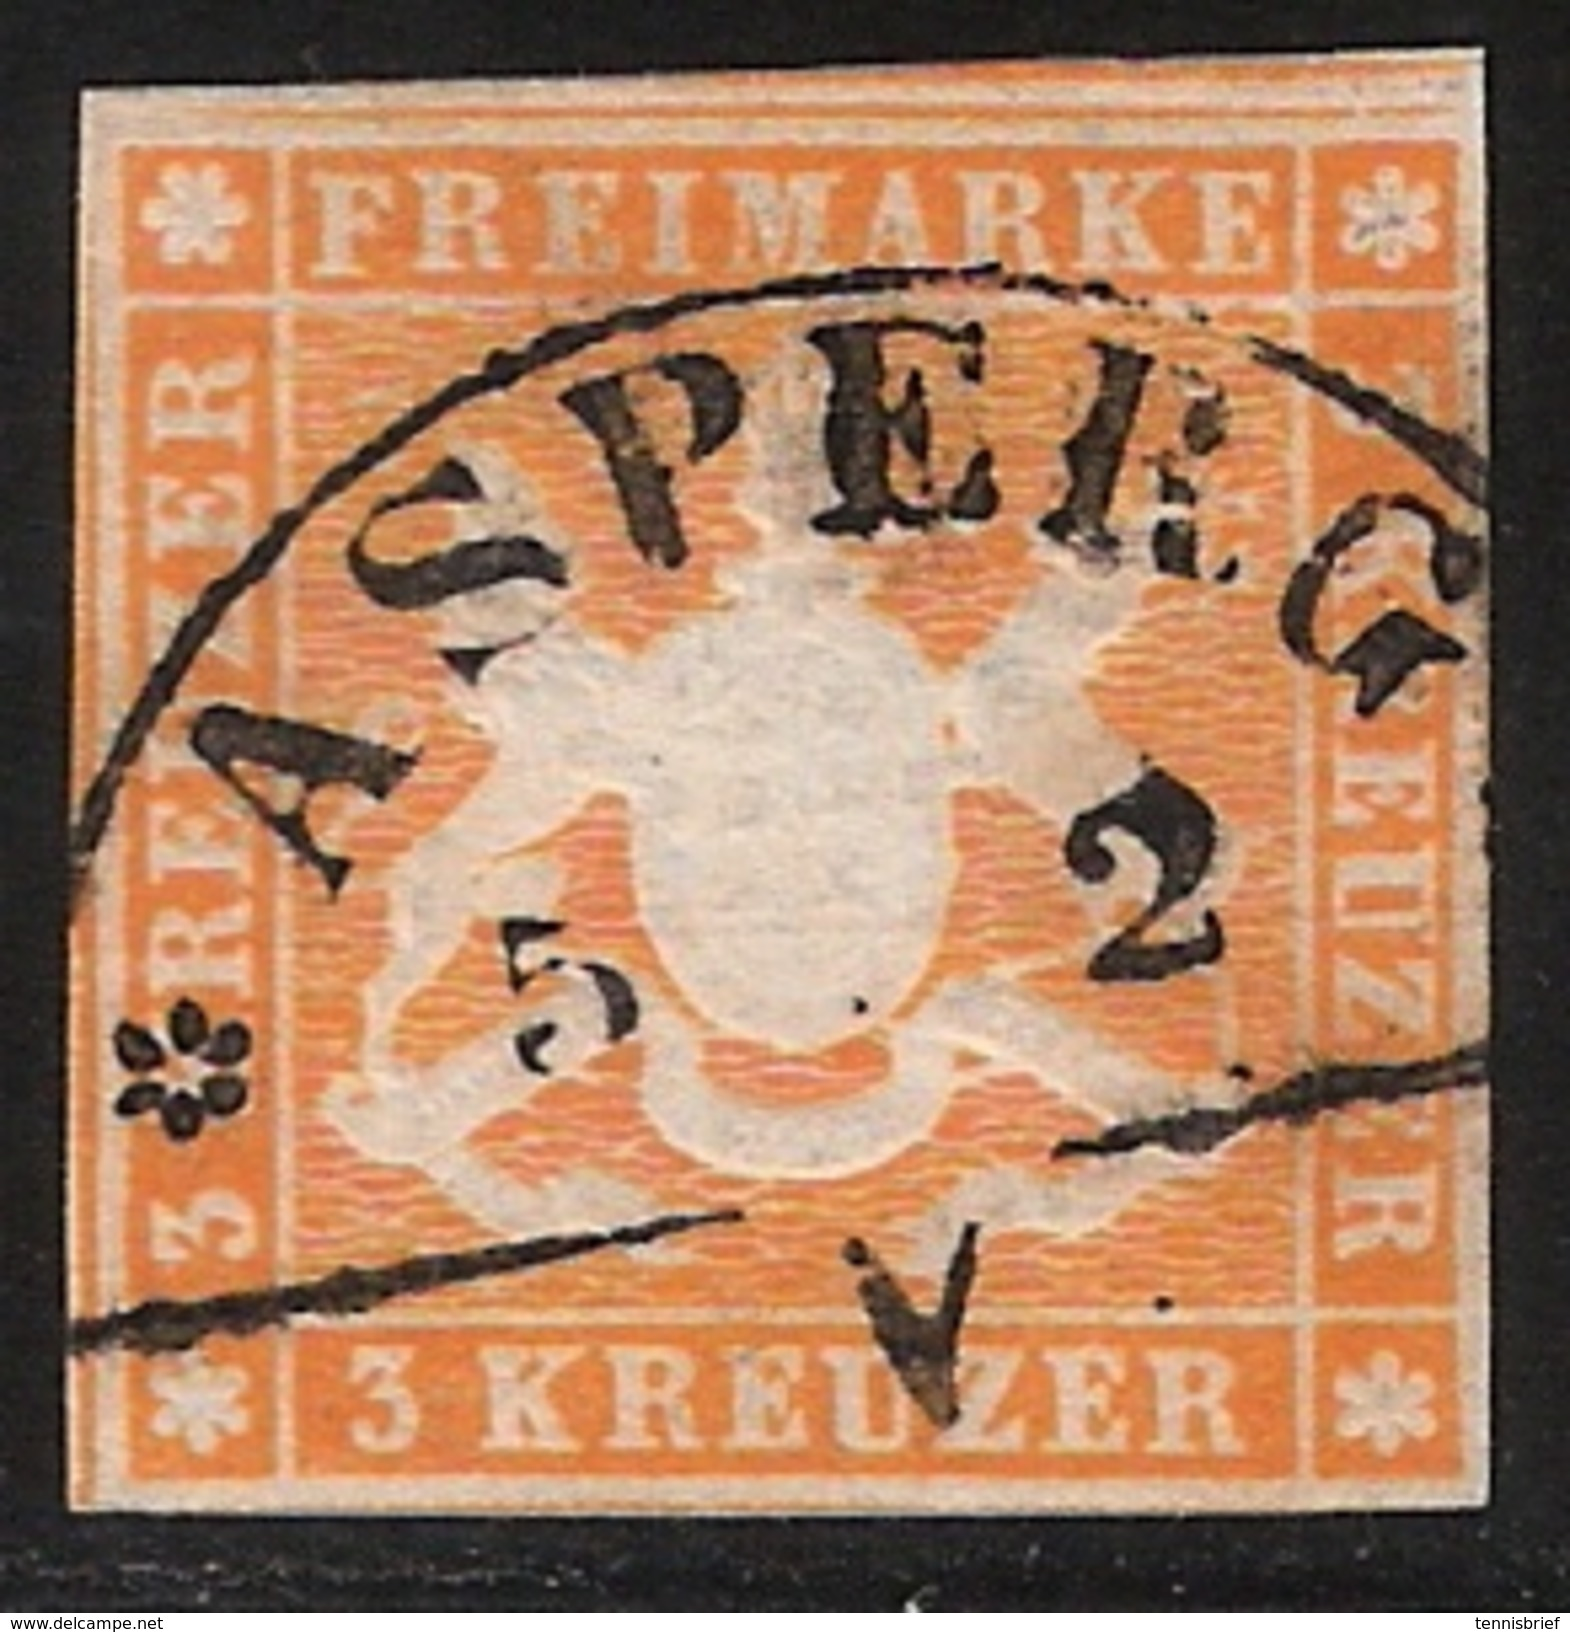 Asperg, Segment, Ideal! , #7311 - Wuerttemberg